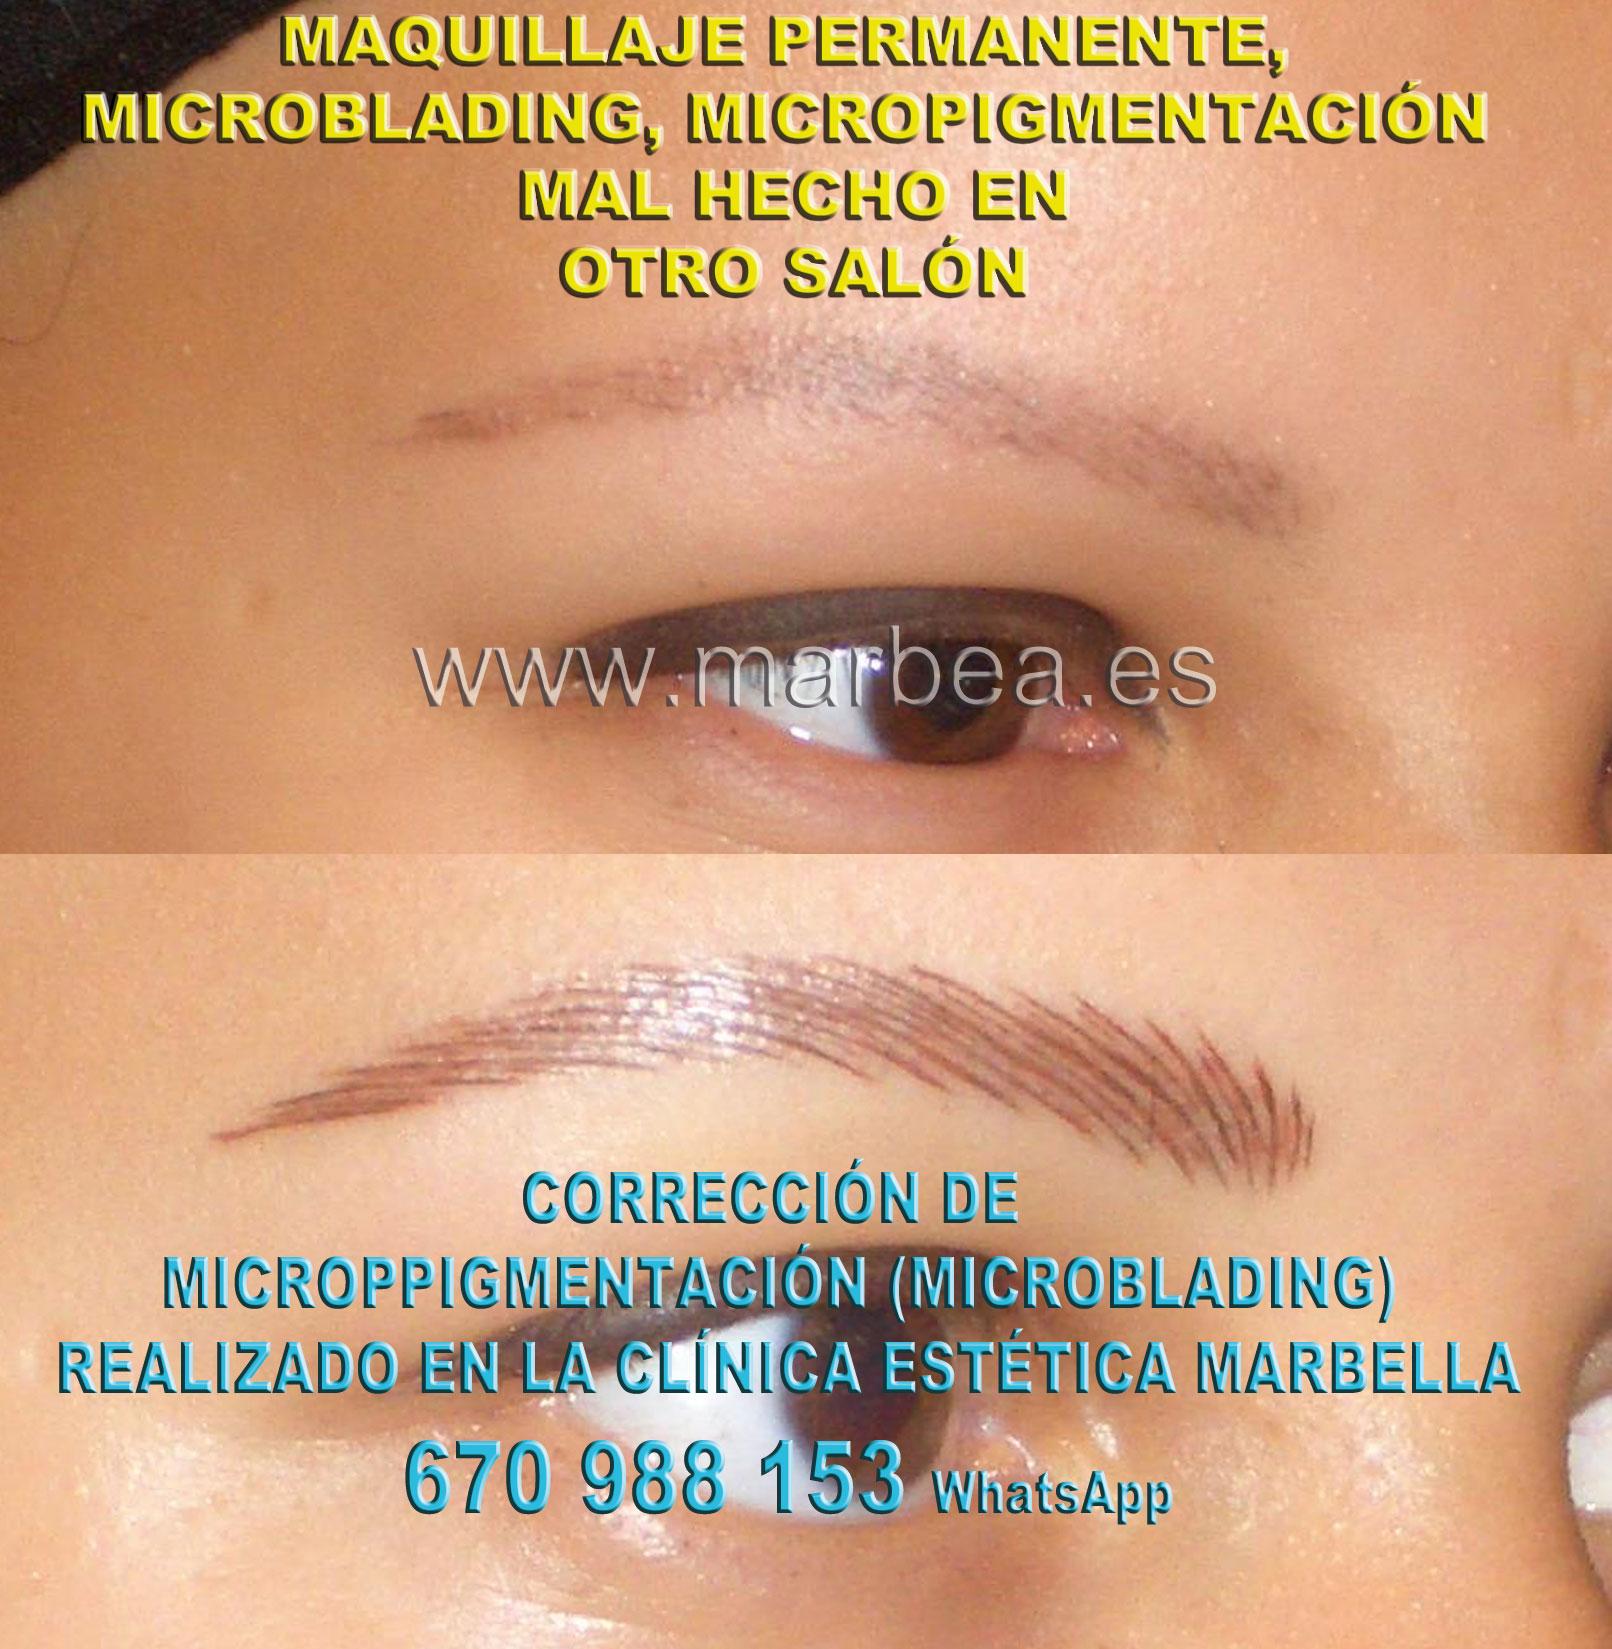 MAQUILLAJE PERMANENTE CEJAS MAL HECHO clínica estética tatuaje ofrenda micropigmentacion correctiva de cejas,corregir micropigmentación mal hecha